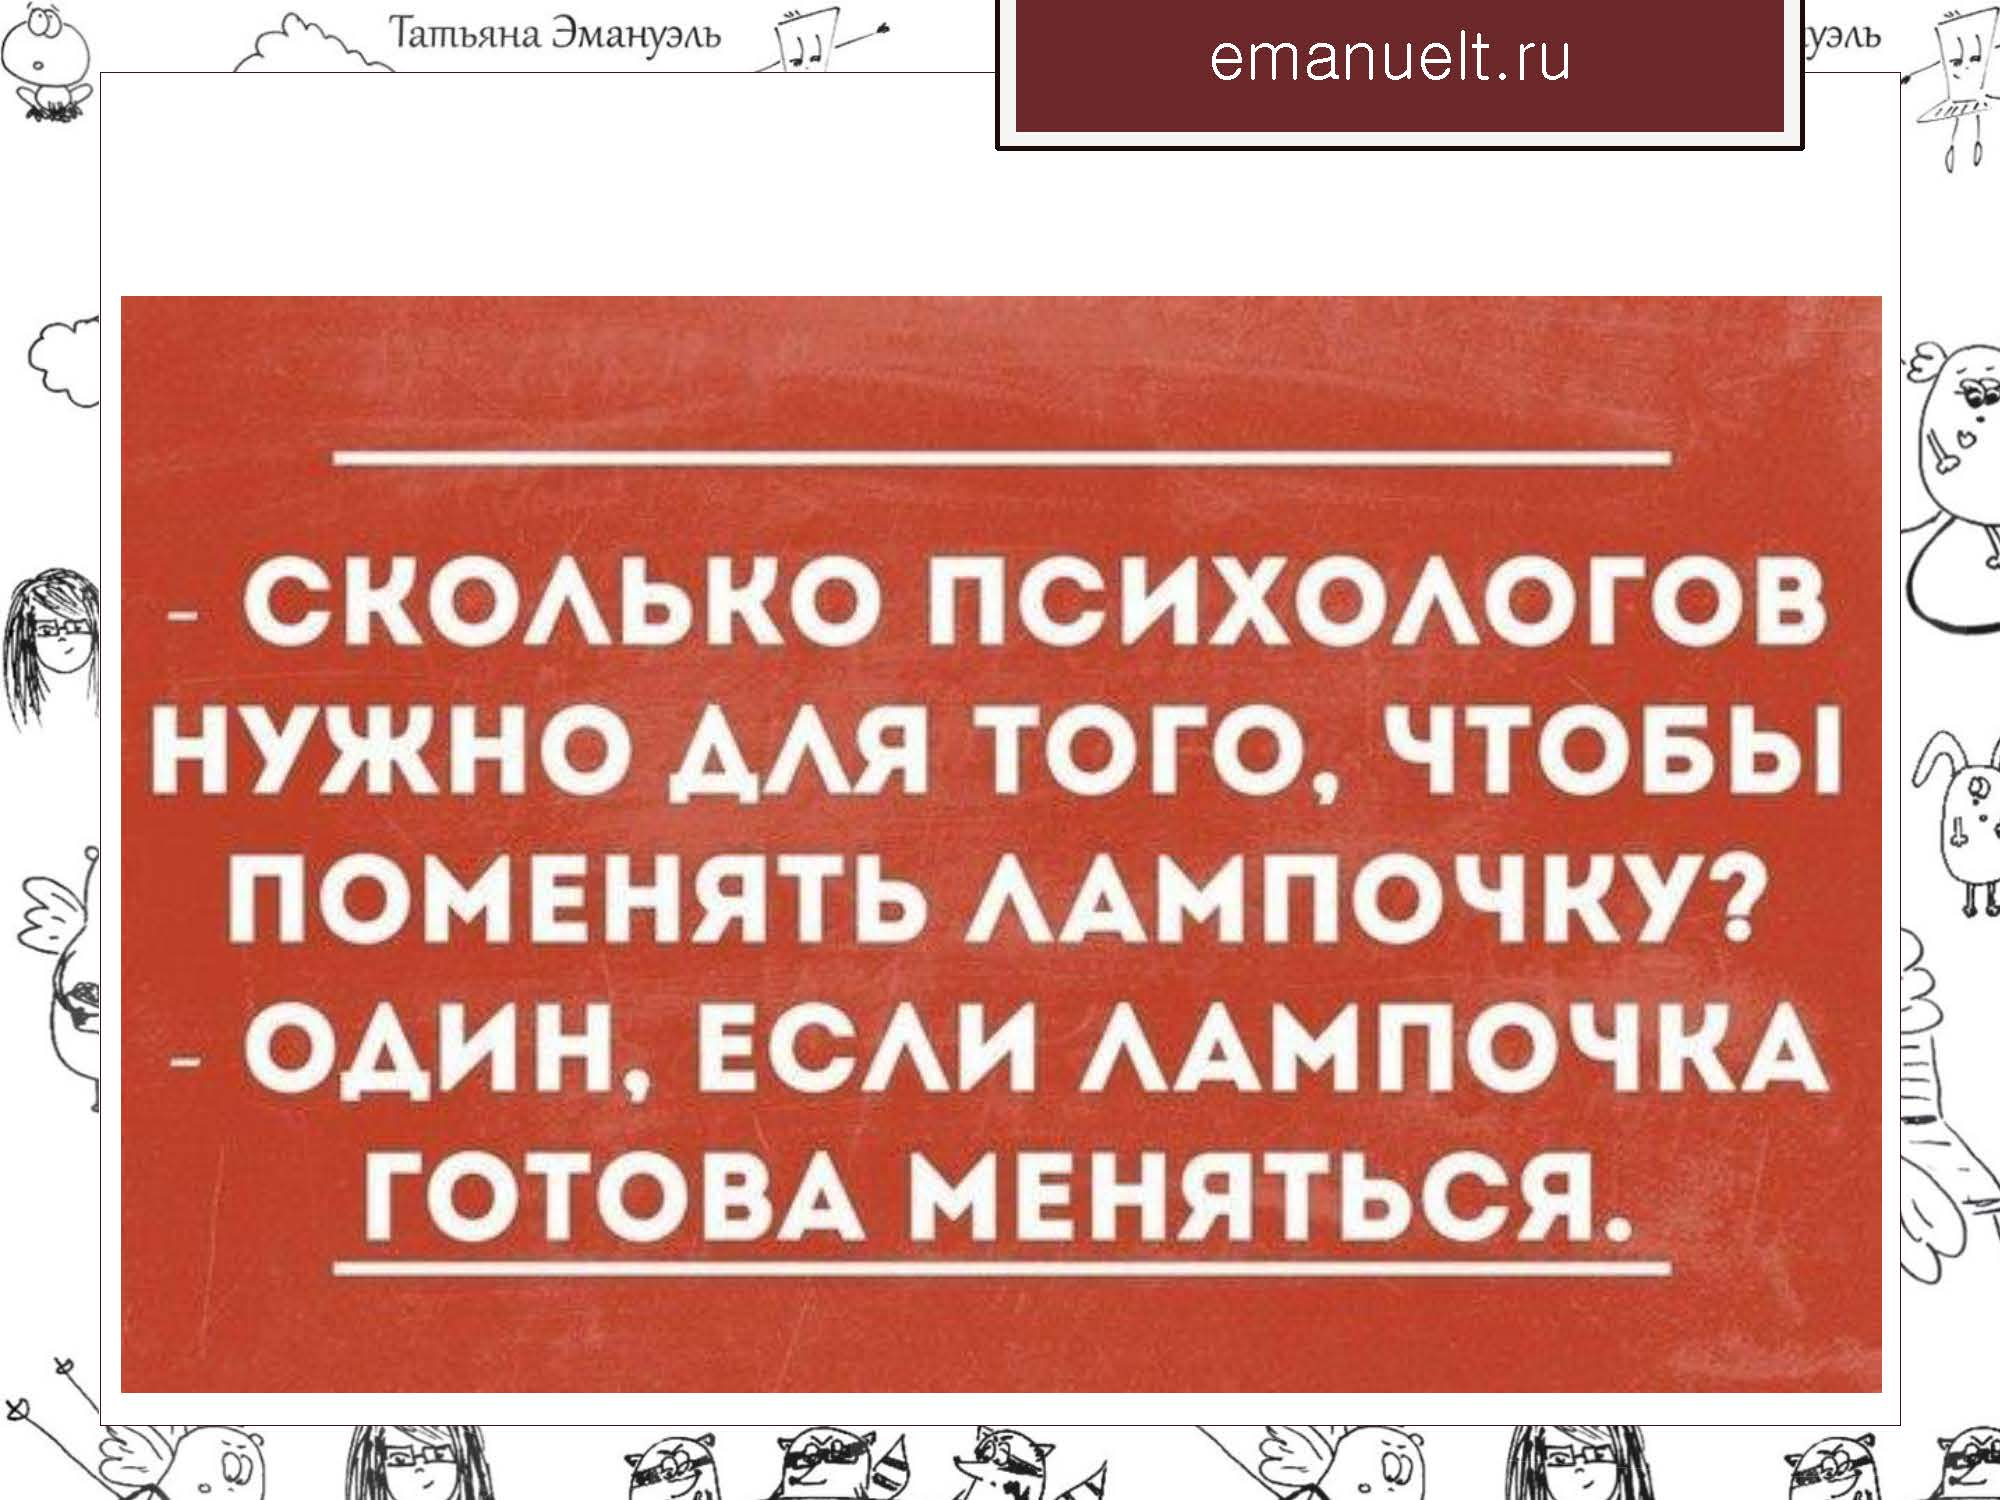 06 февраля эмануэль_Страница_049